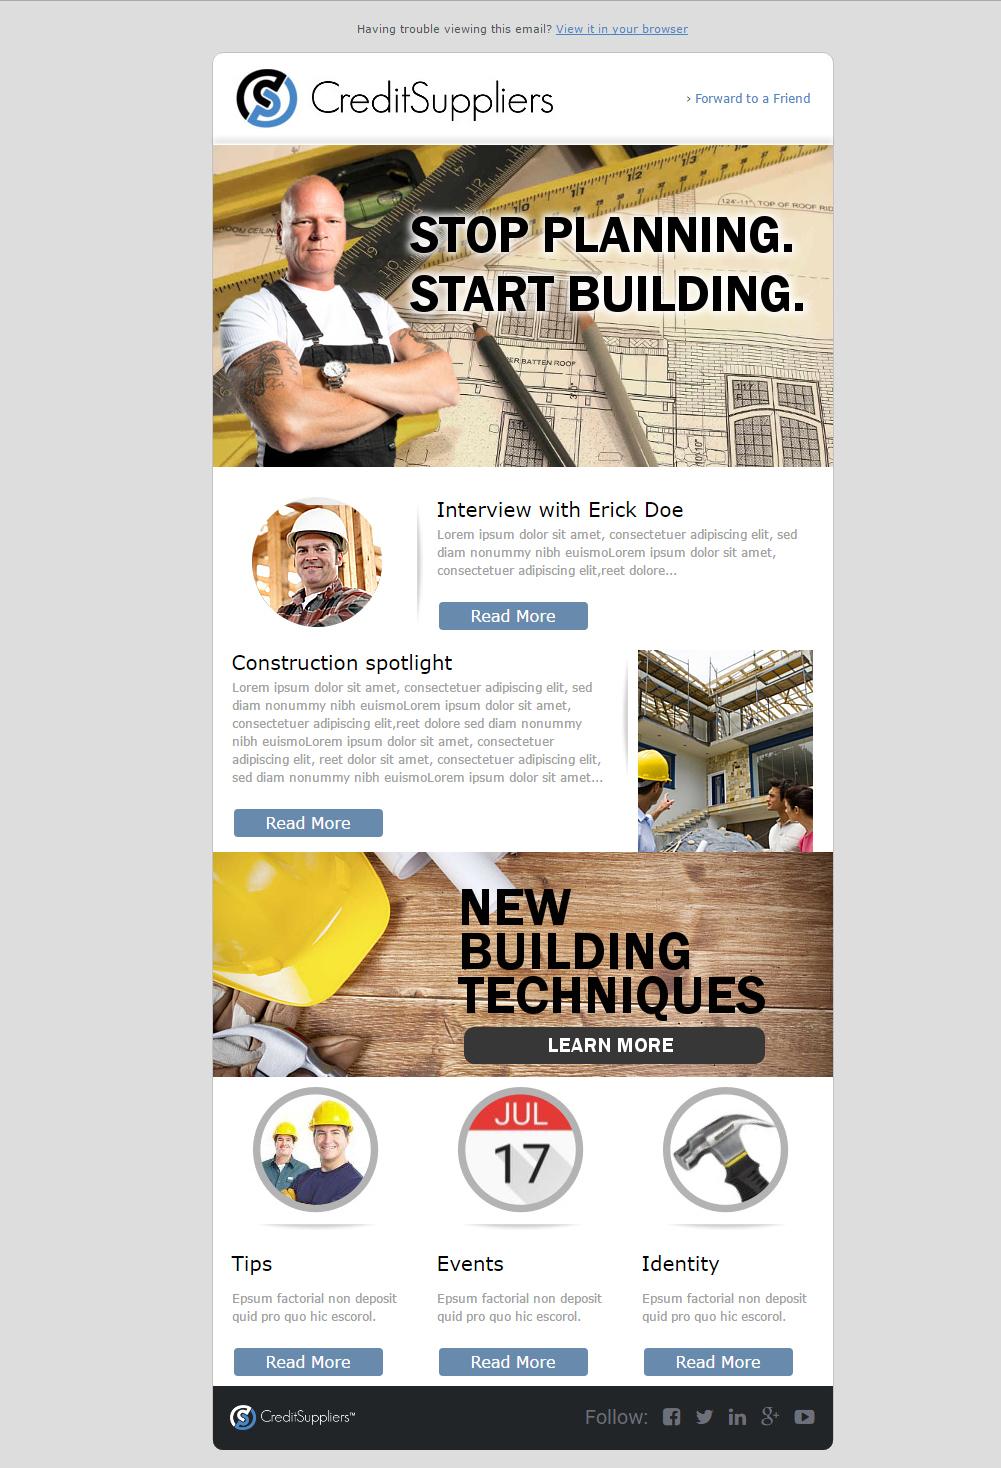 Poster design jobs online - Great Newsletter Design Job Html Newsletter Template For Company Winning Design By Angel Ascanio With Design Job Online